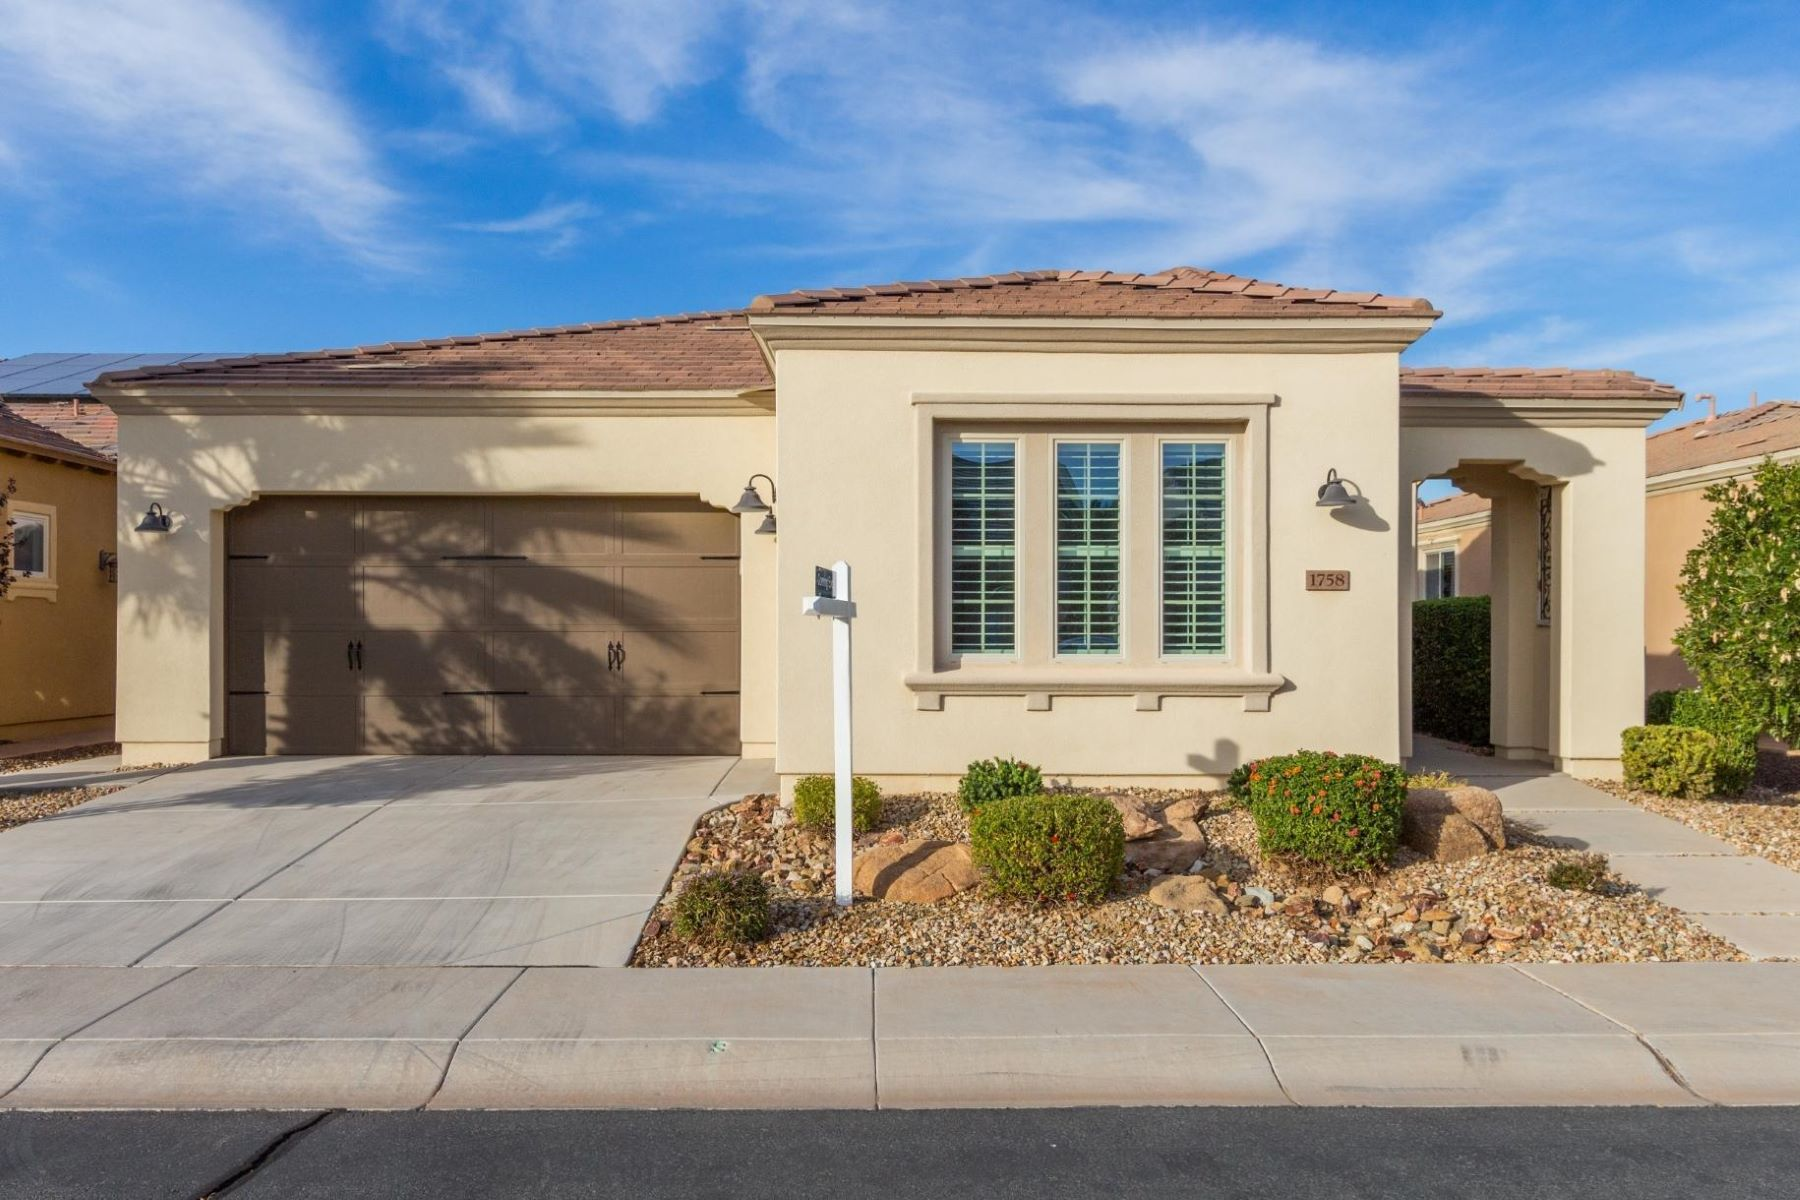 Single Family Homes for Active at Encanterra Country Club 1758 E Hesperus Way San Tan Valley, Arizona 85140 United States